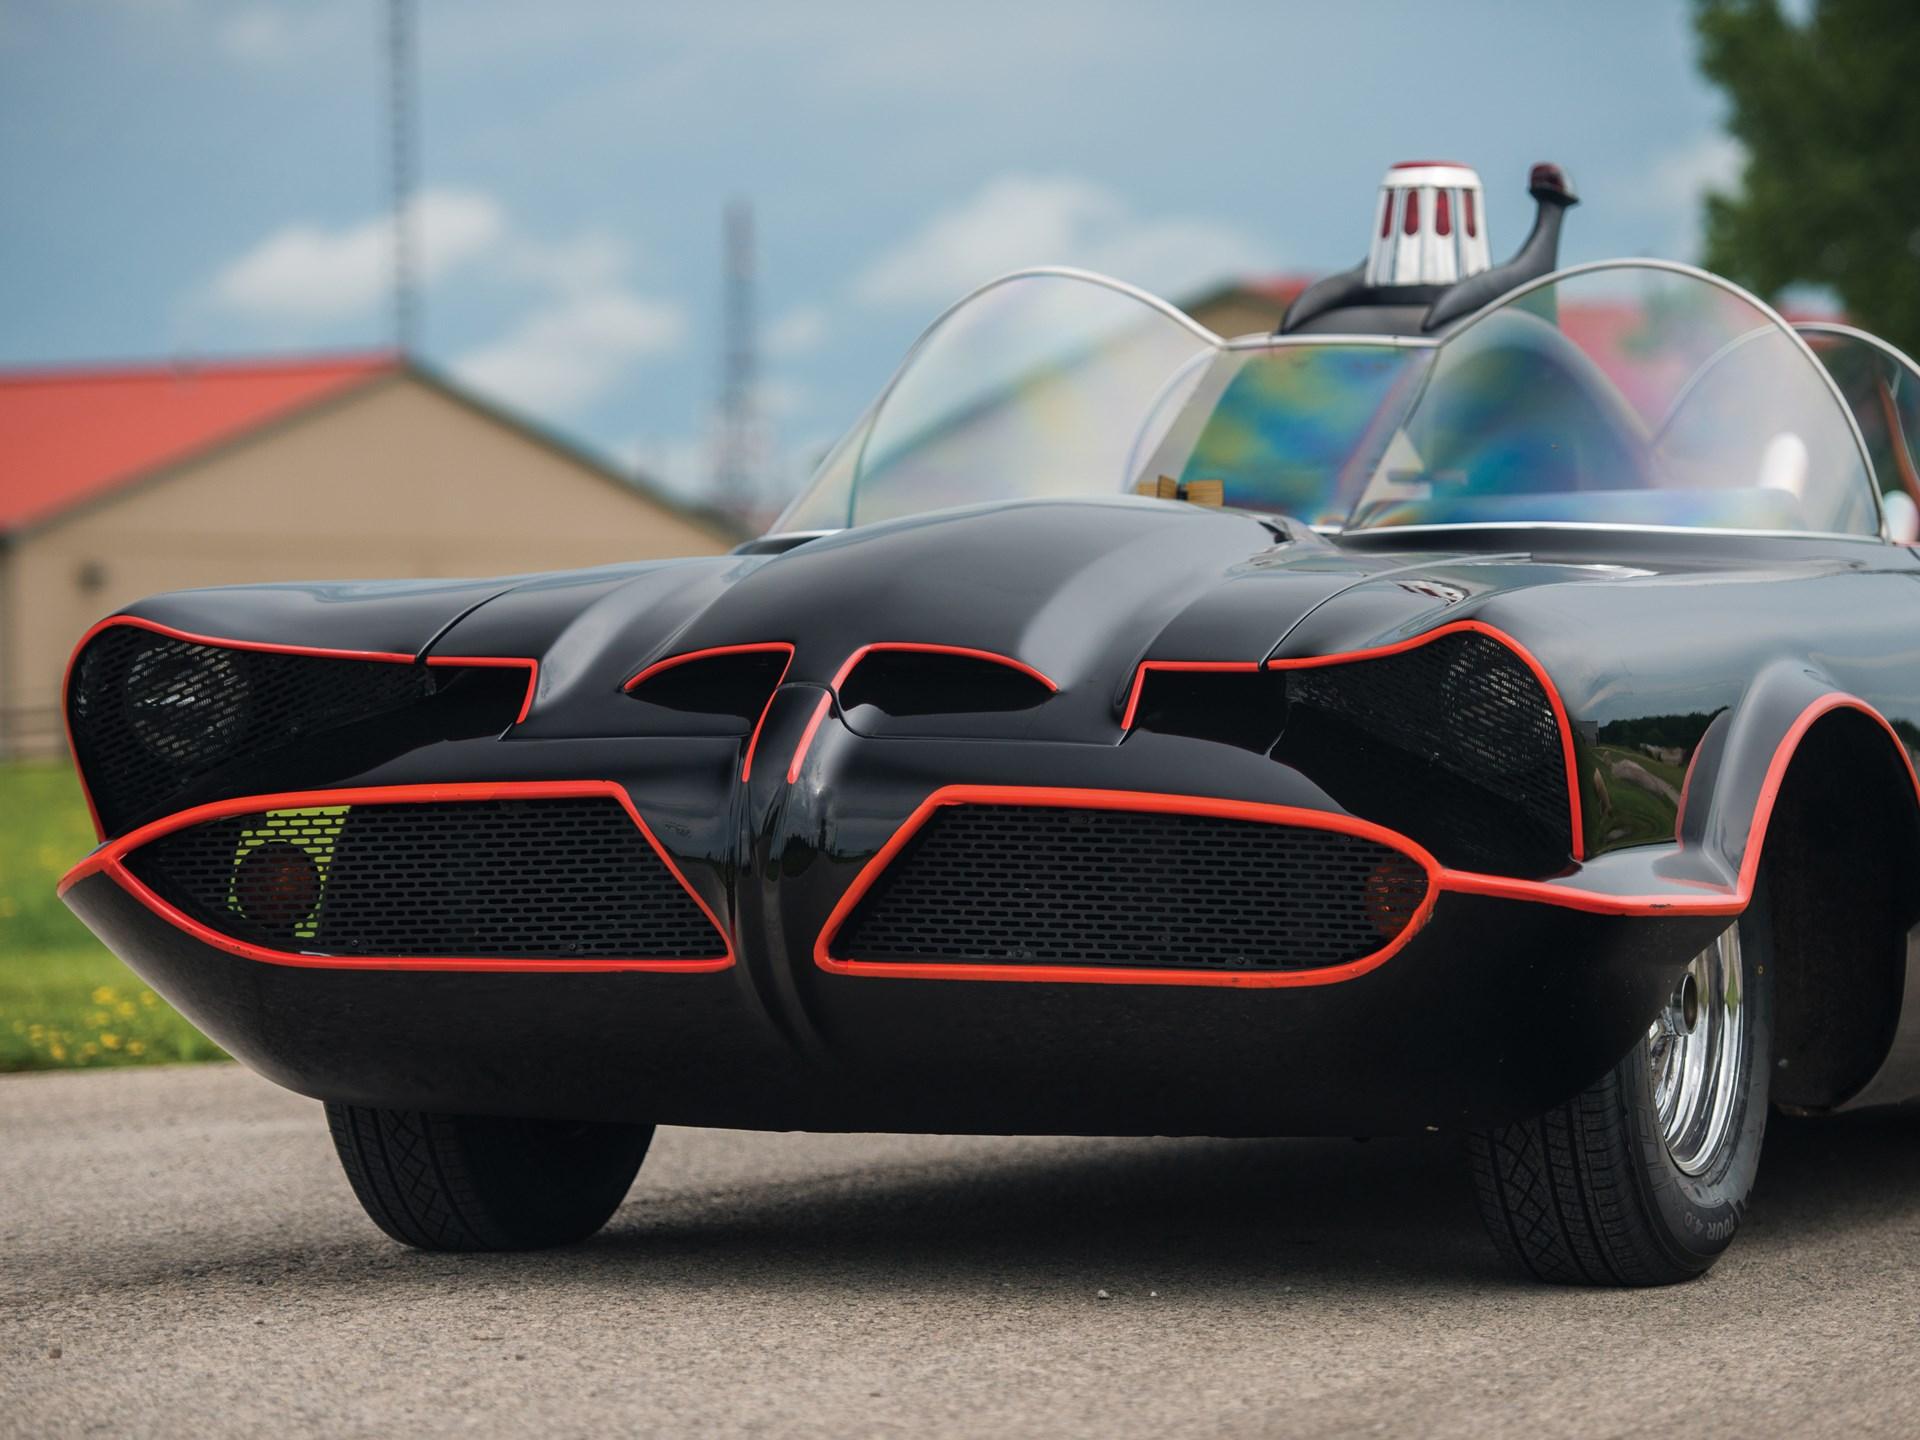 1966 Batmobile Recreation front grille